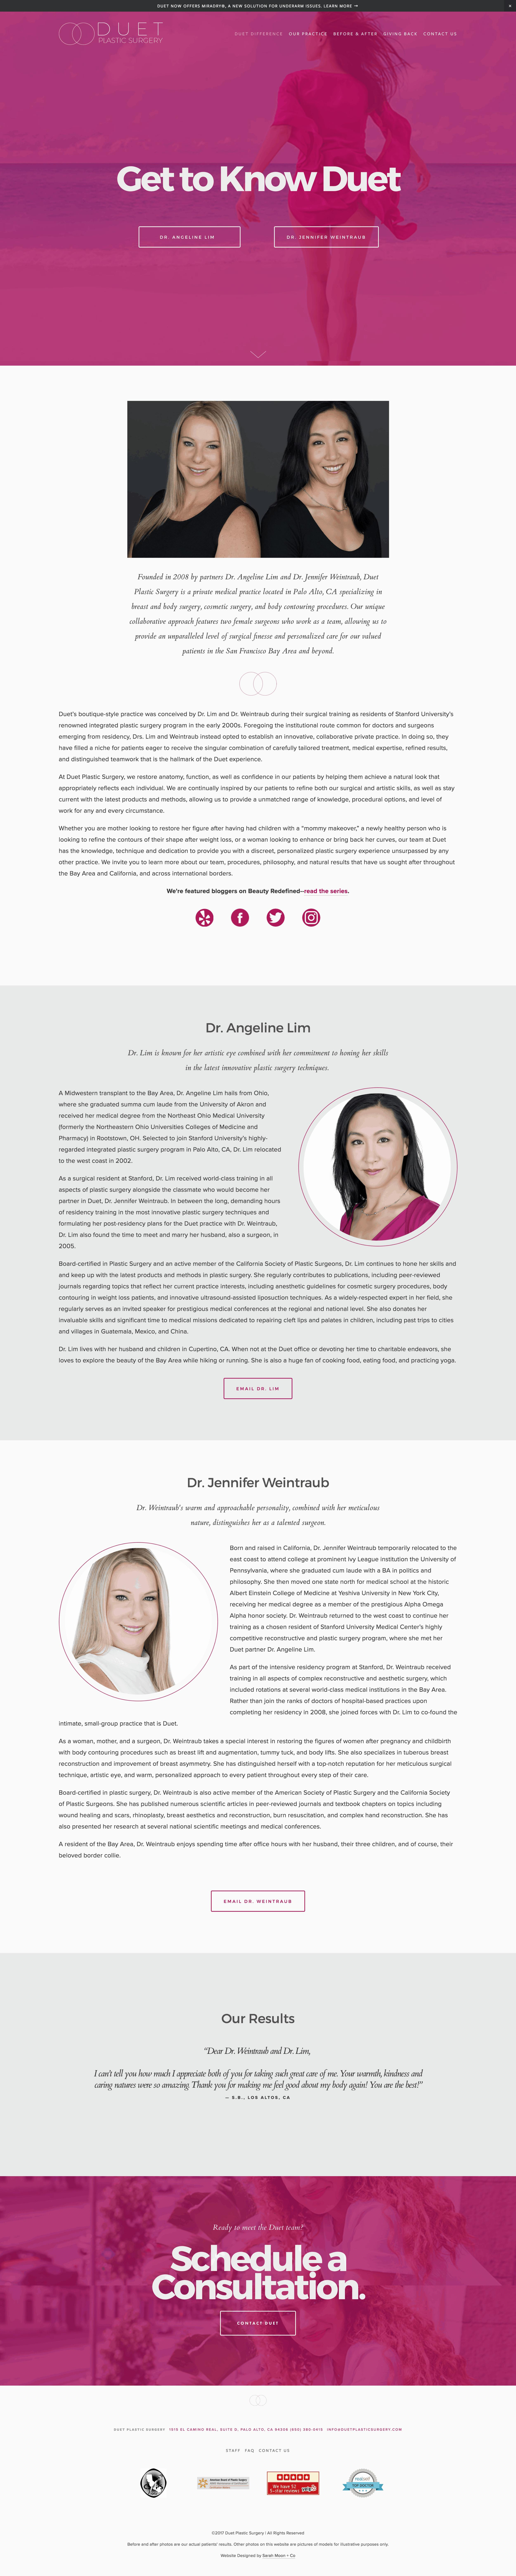 Duet Plastic Surgery Website Redesign